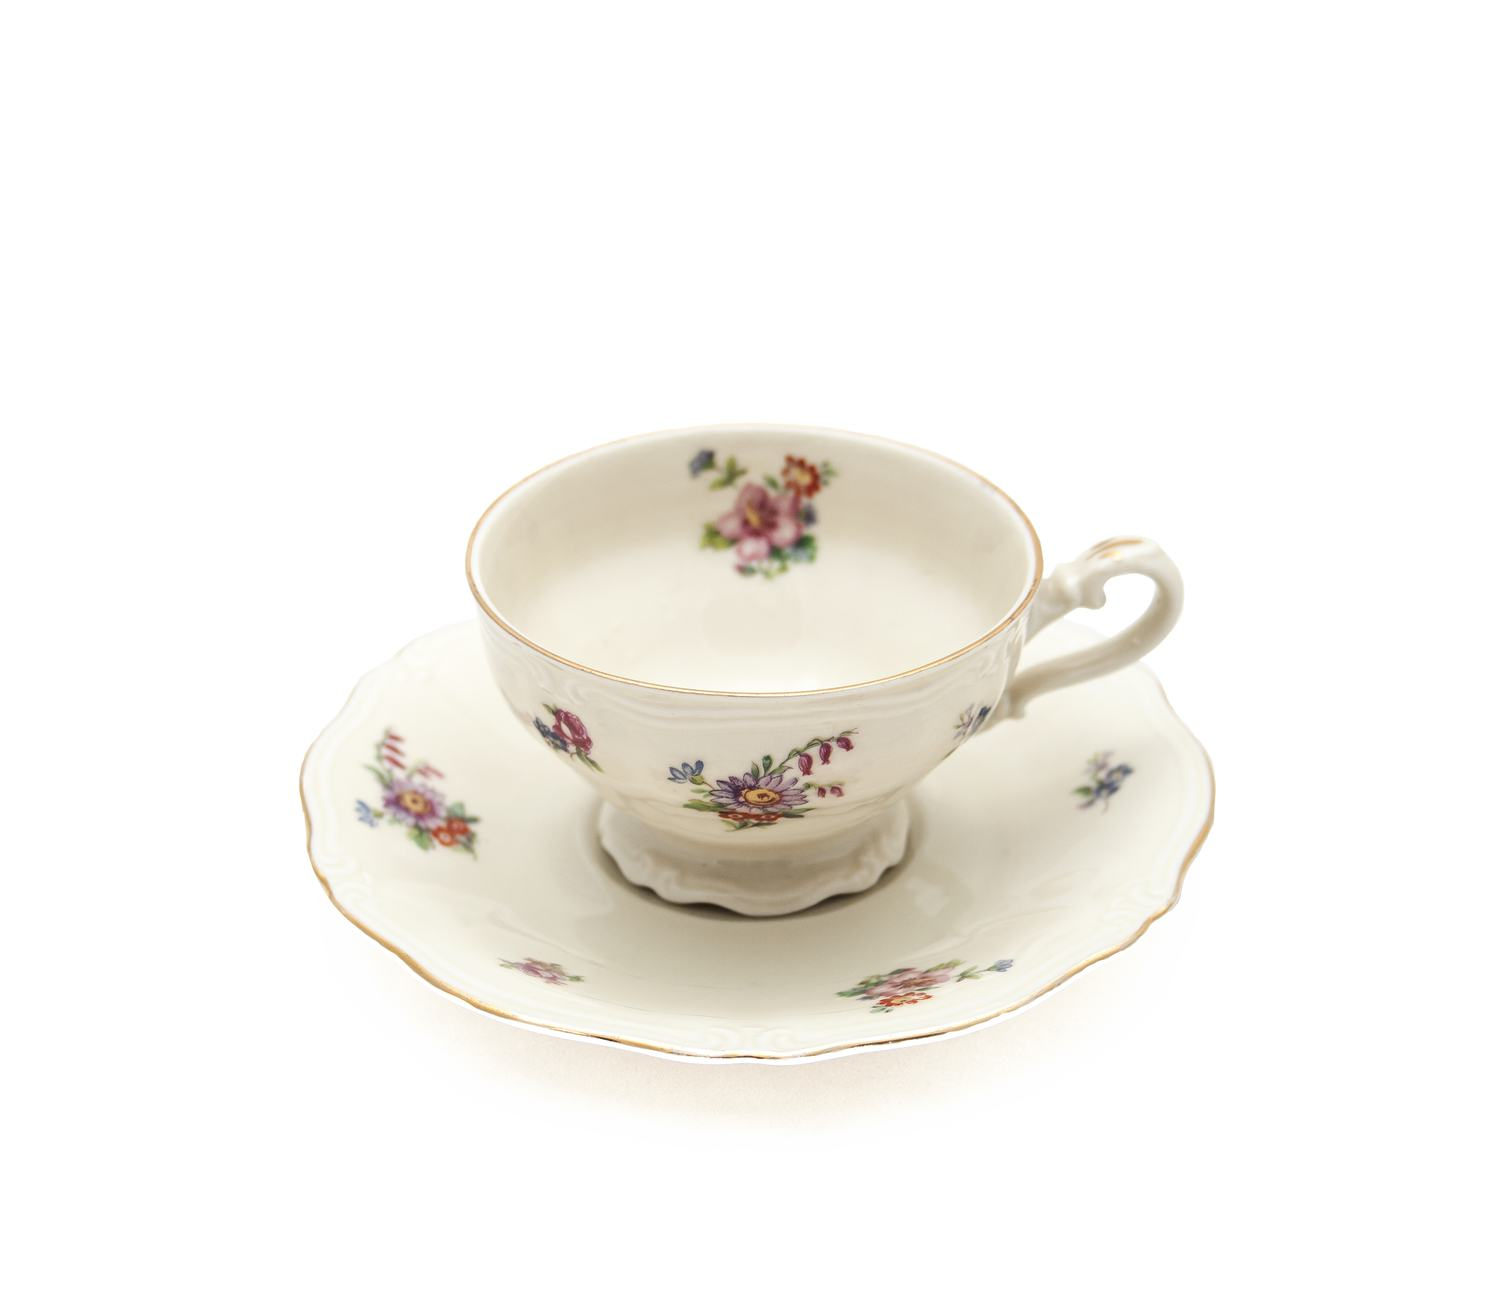 Old Porcelain Cup